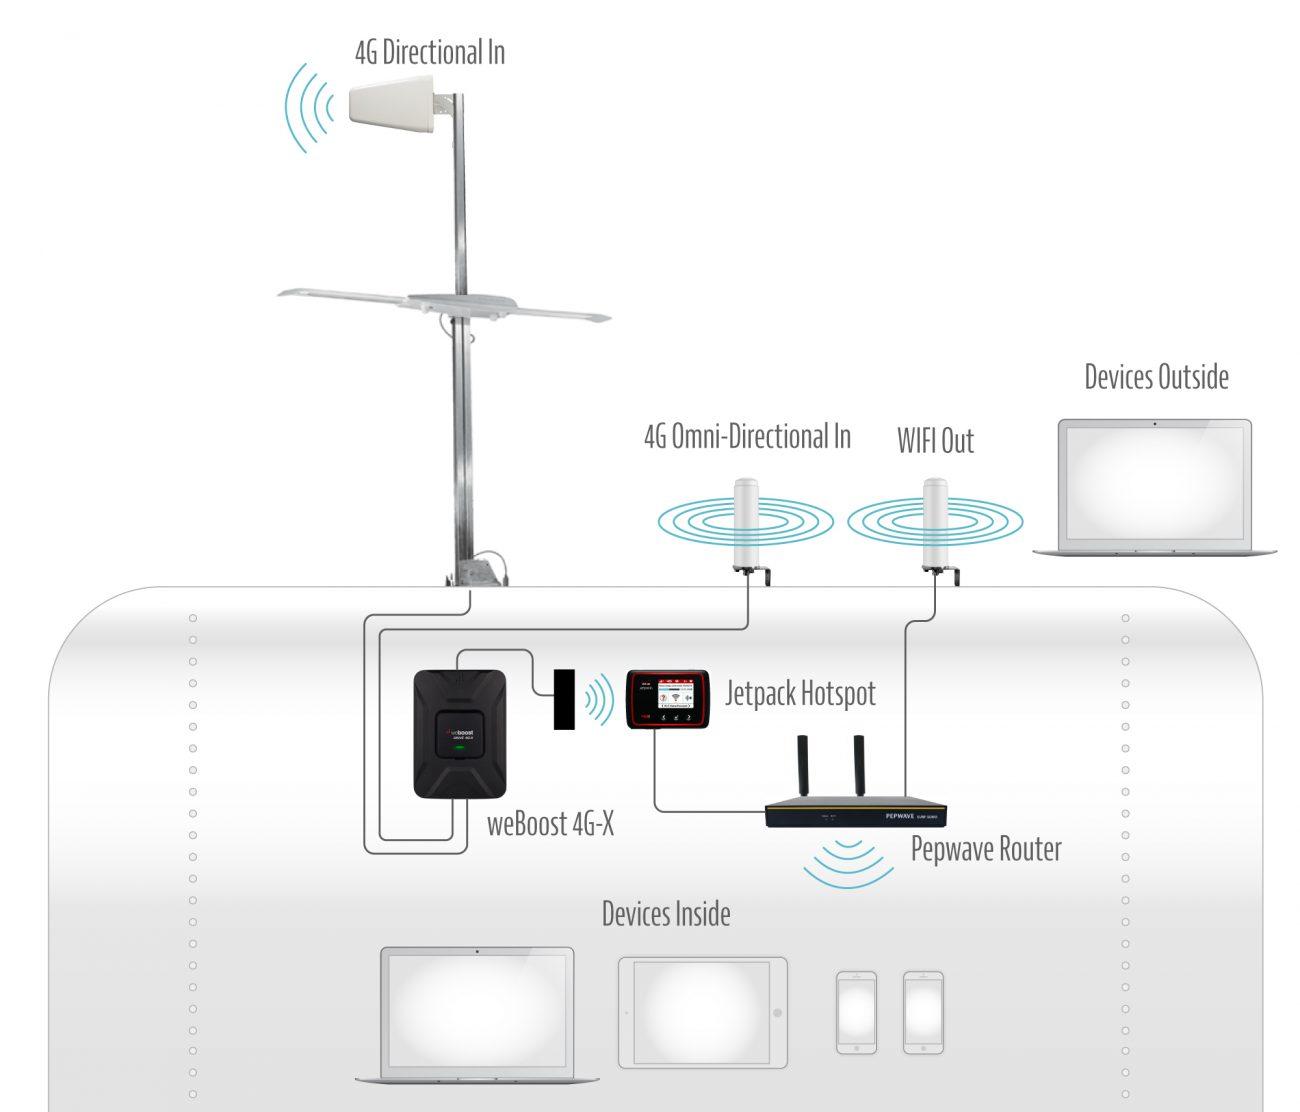 hight resolution of internet setup illustration